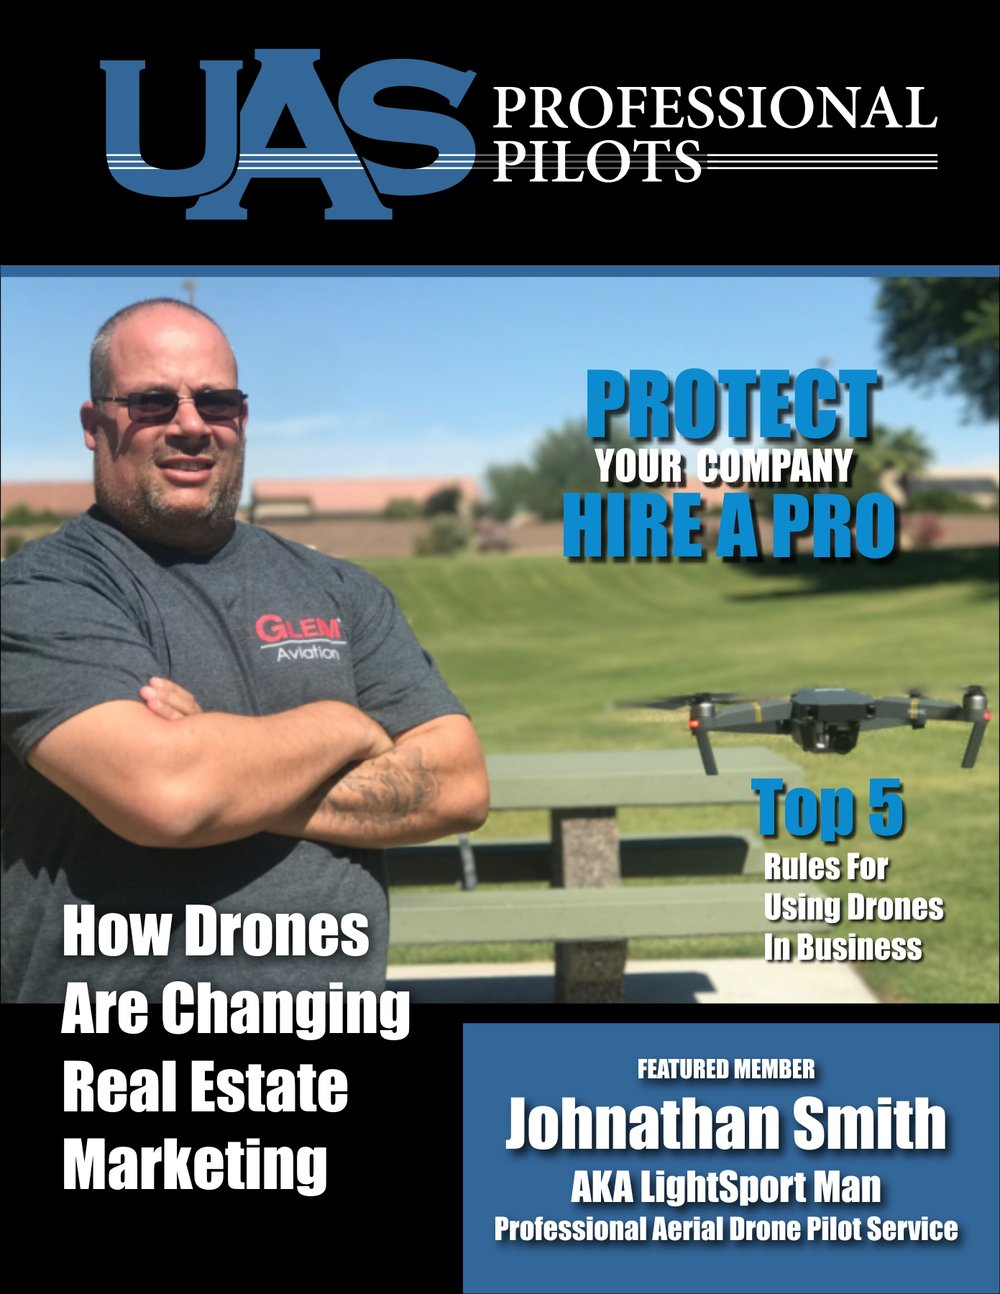 UAS Professional Pilot LightSport - Protect Your Company Hire A Pro